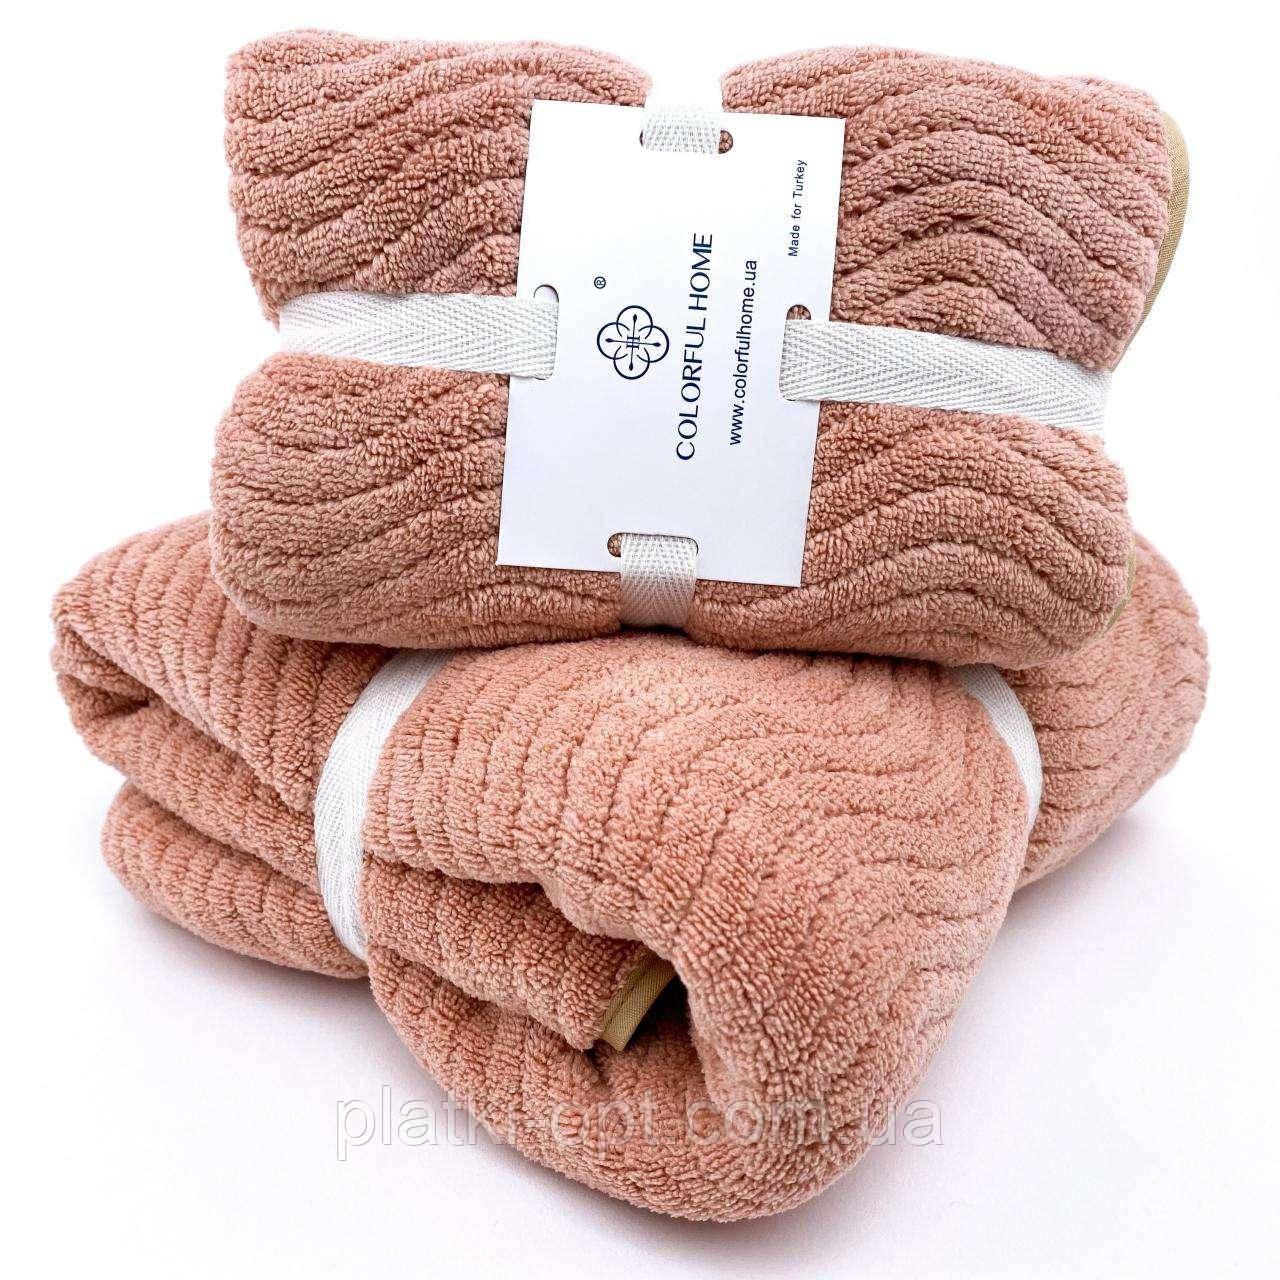 Комплект полотенец Волна (микрофибра) пудра